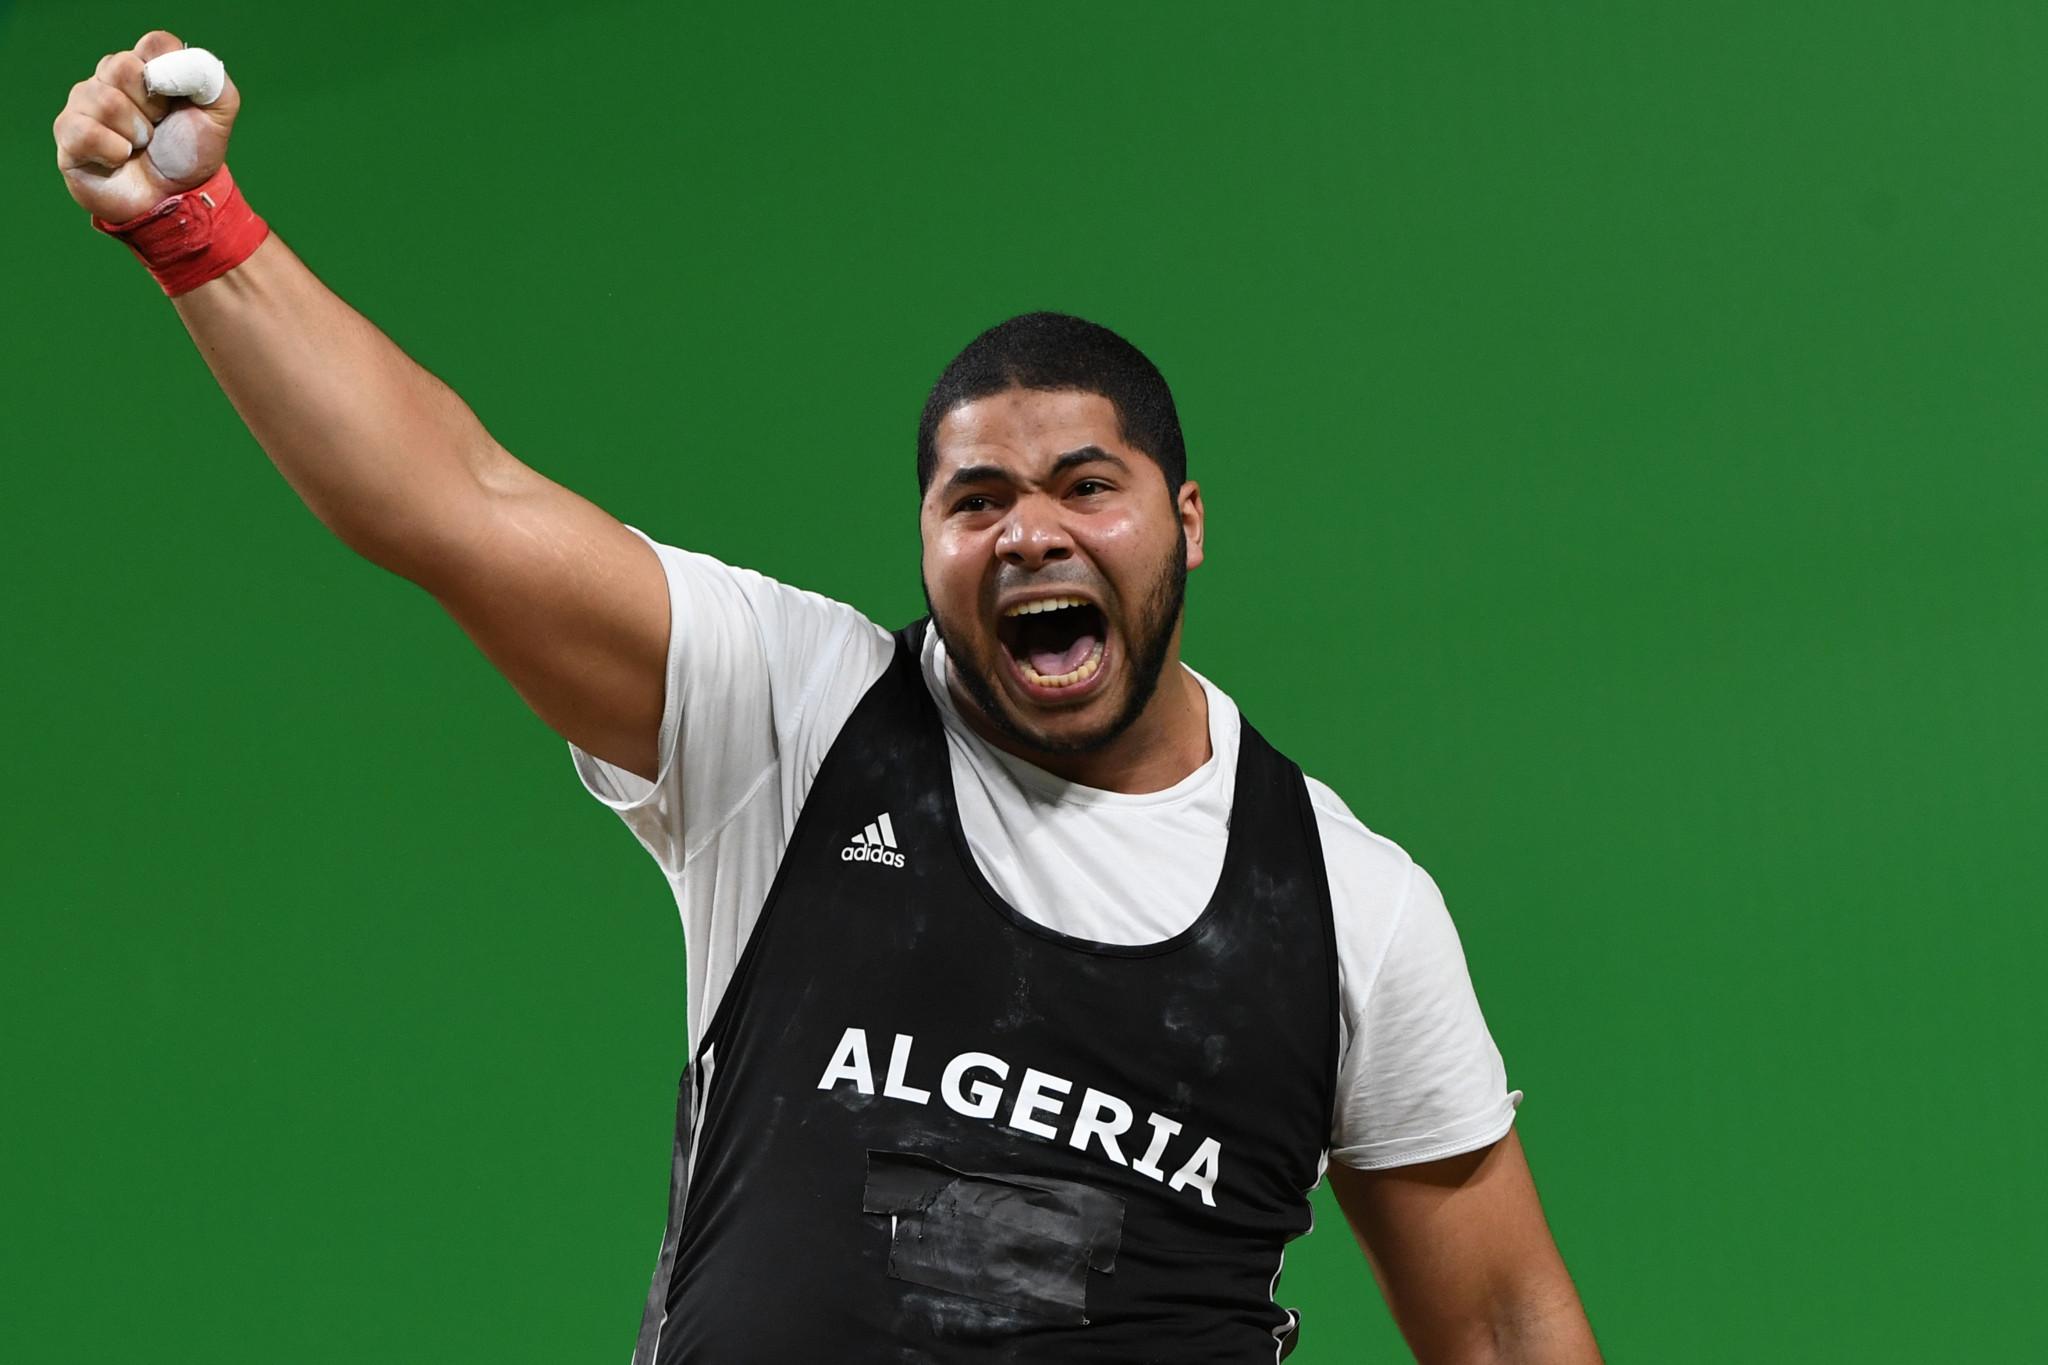 Algerian super-heavyweight Bidani sets record at African Weightlifting Championships